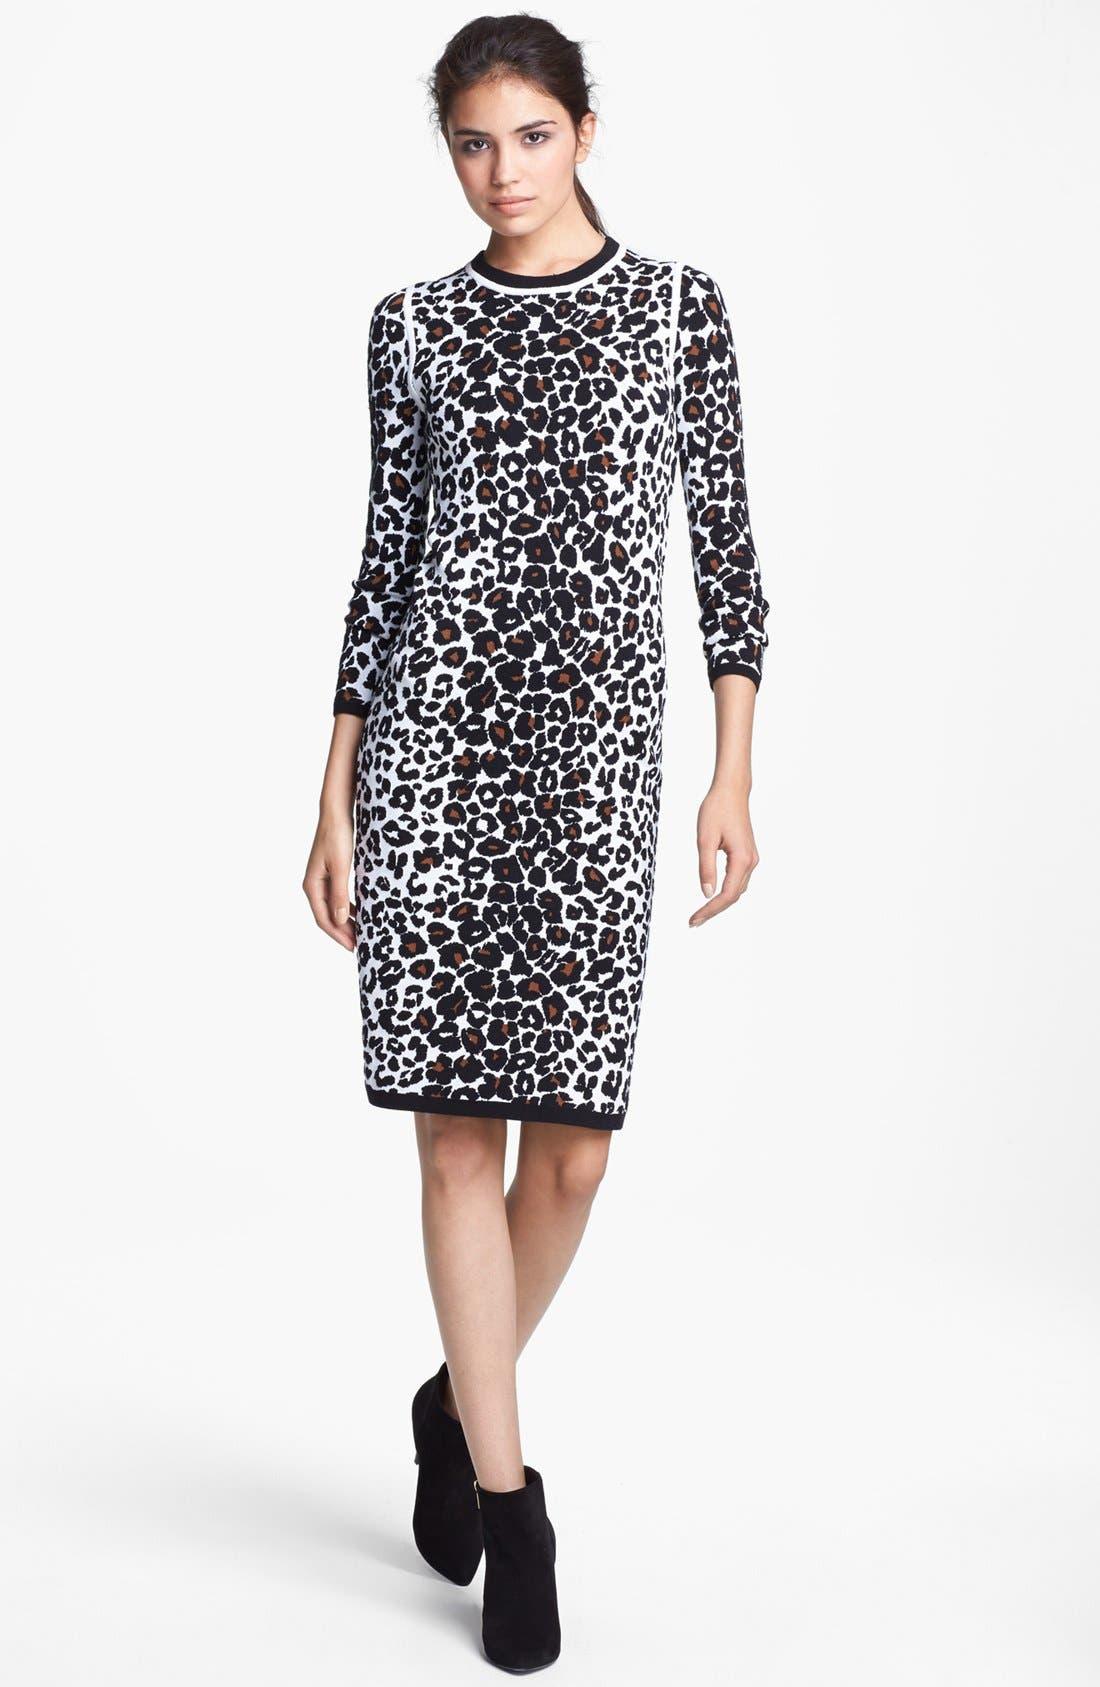 Main Image - A.L.C. 'Smith' Long Sleeve Leopard Pattern Knit Dress